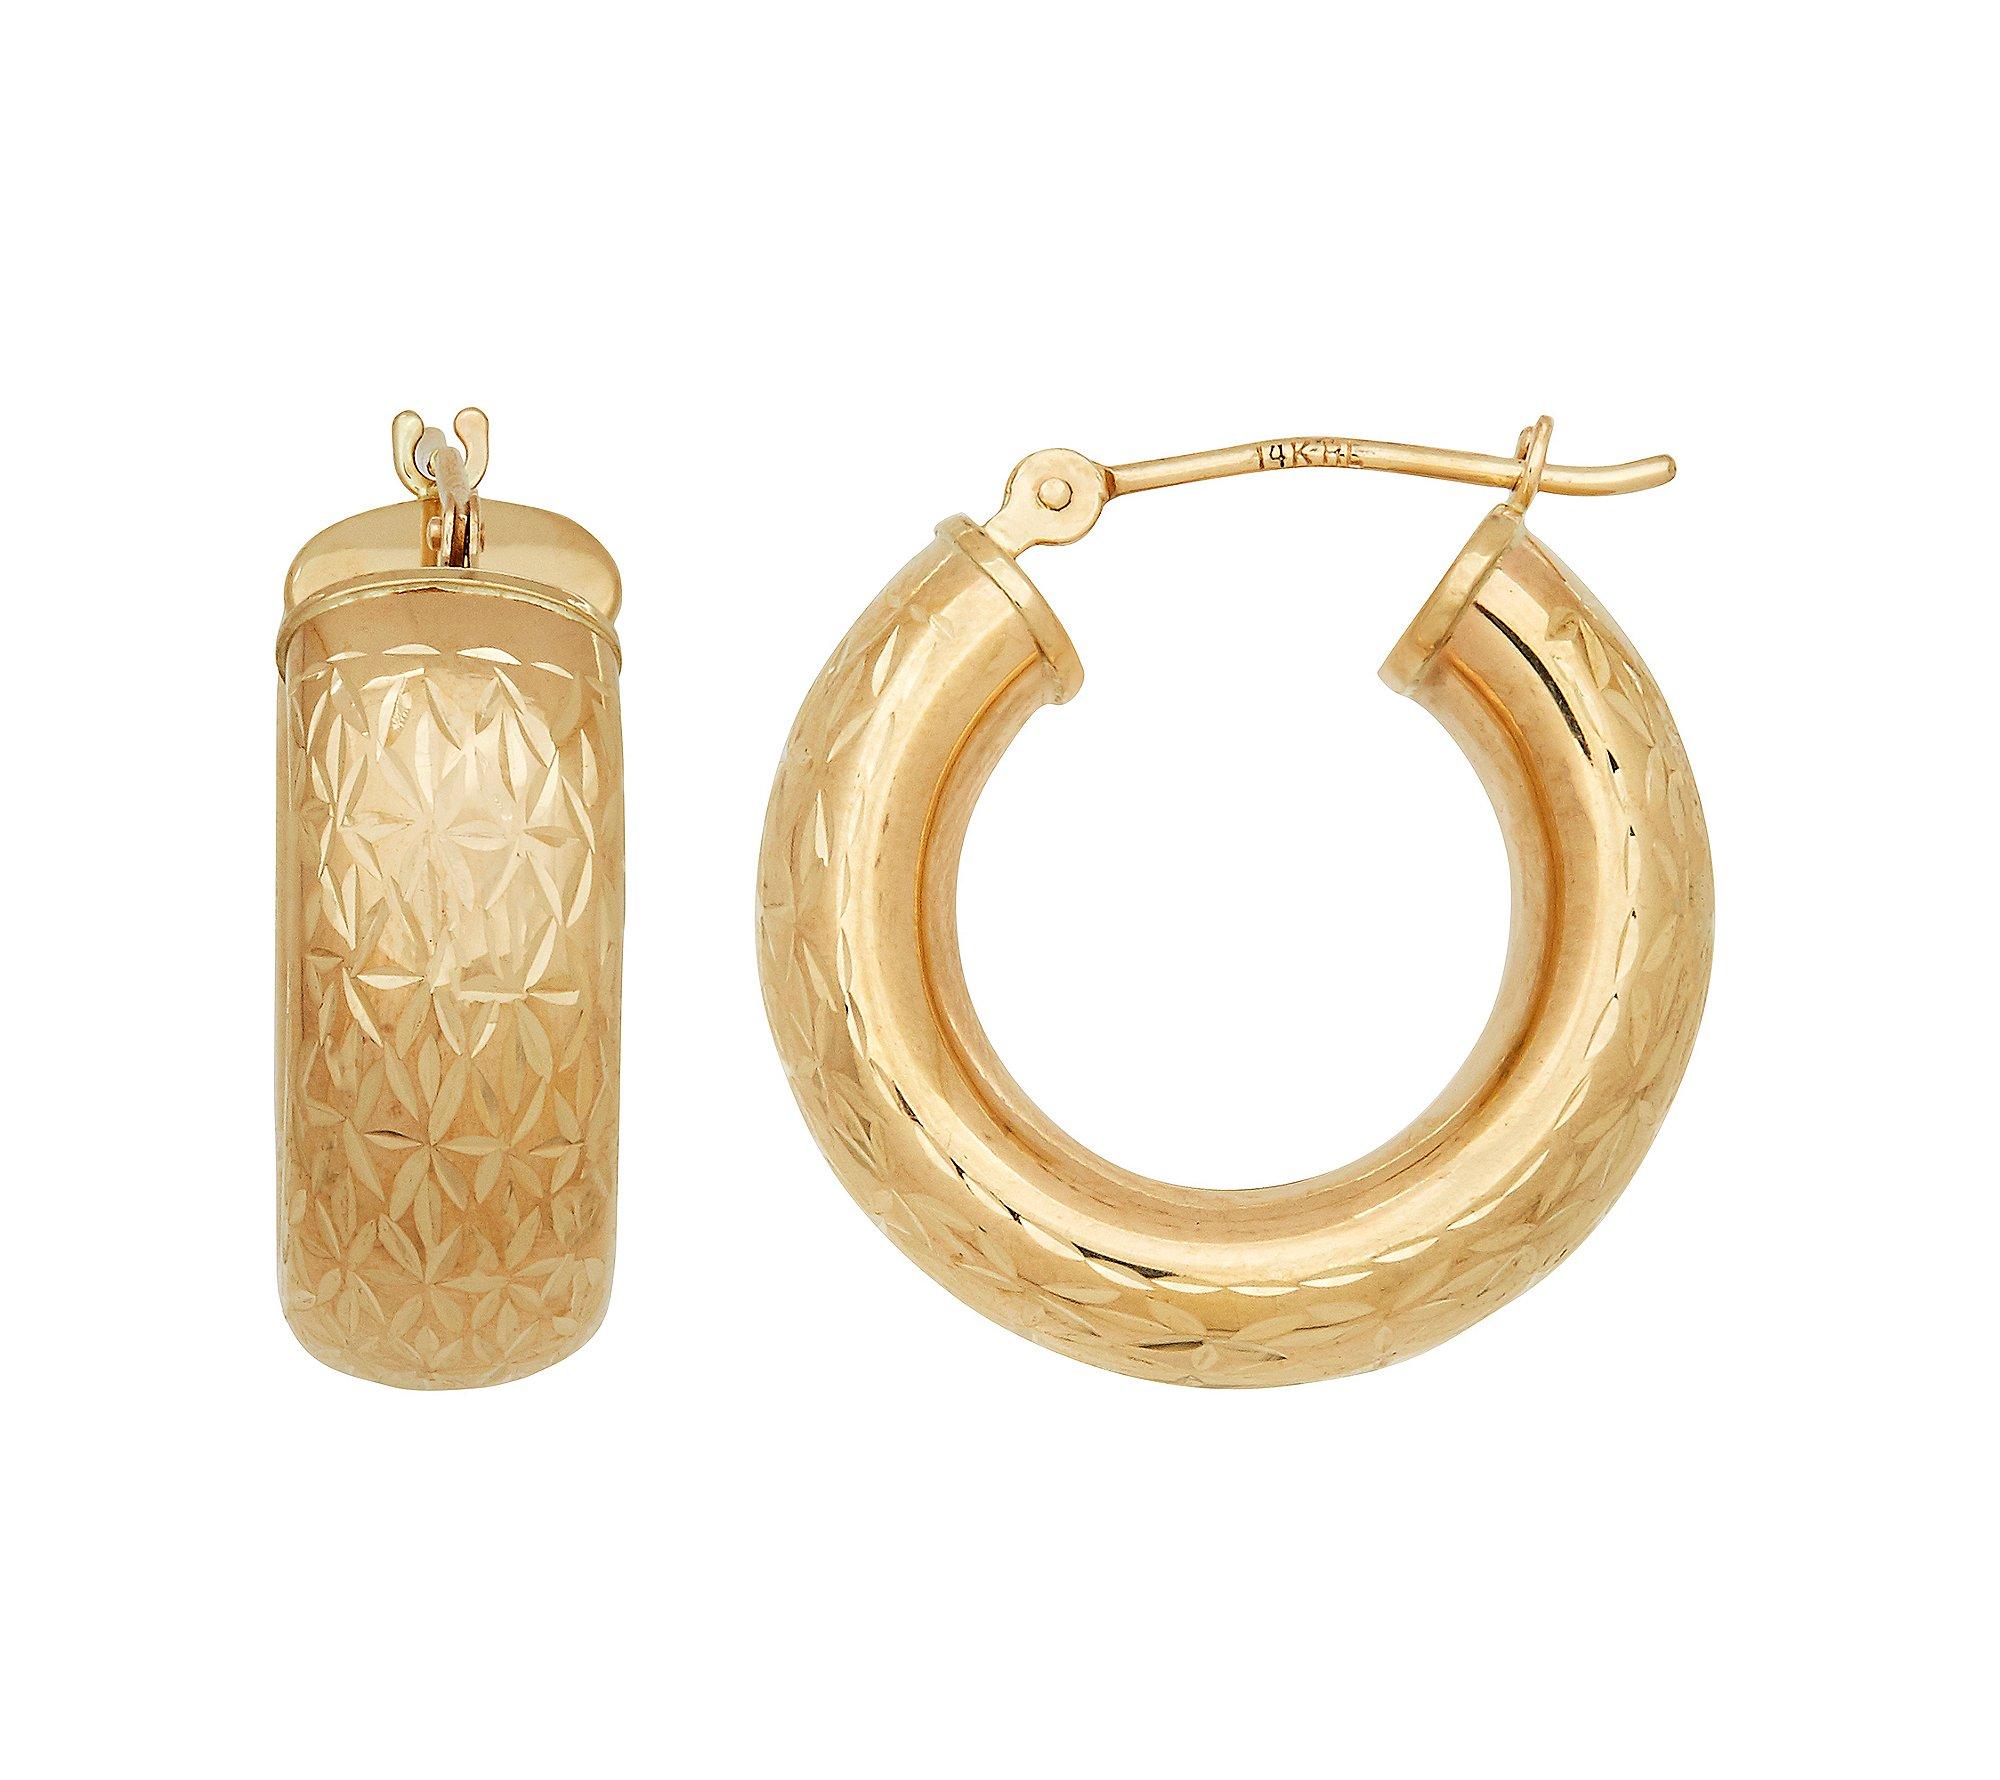 14K Yellow Gold Polished Diamond Cut Round Geometric Pattern Hoop Earrings